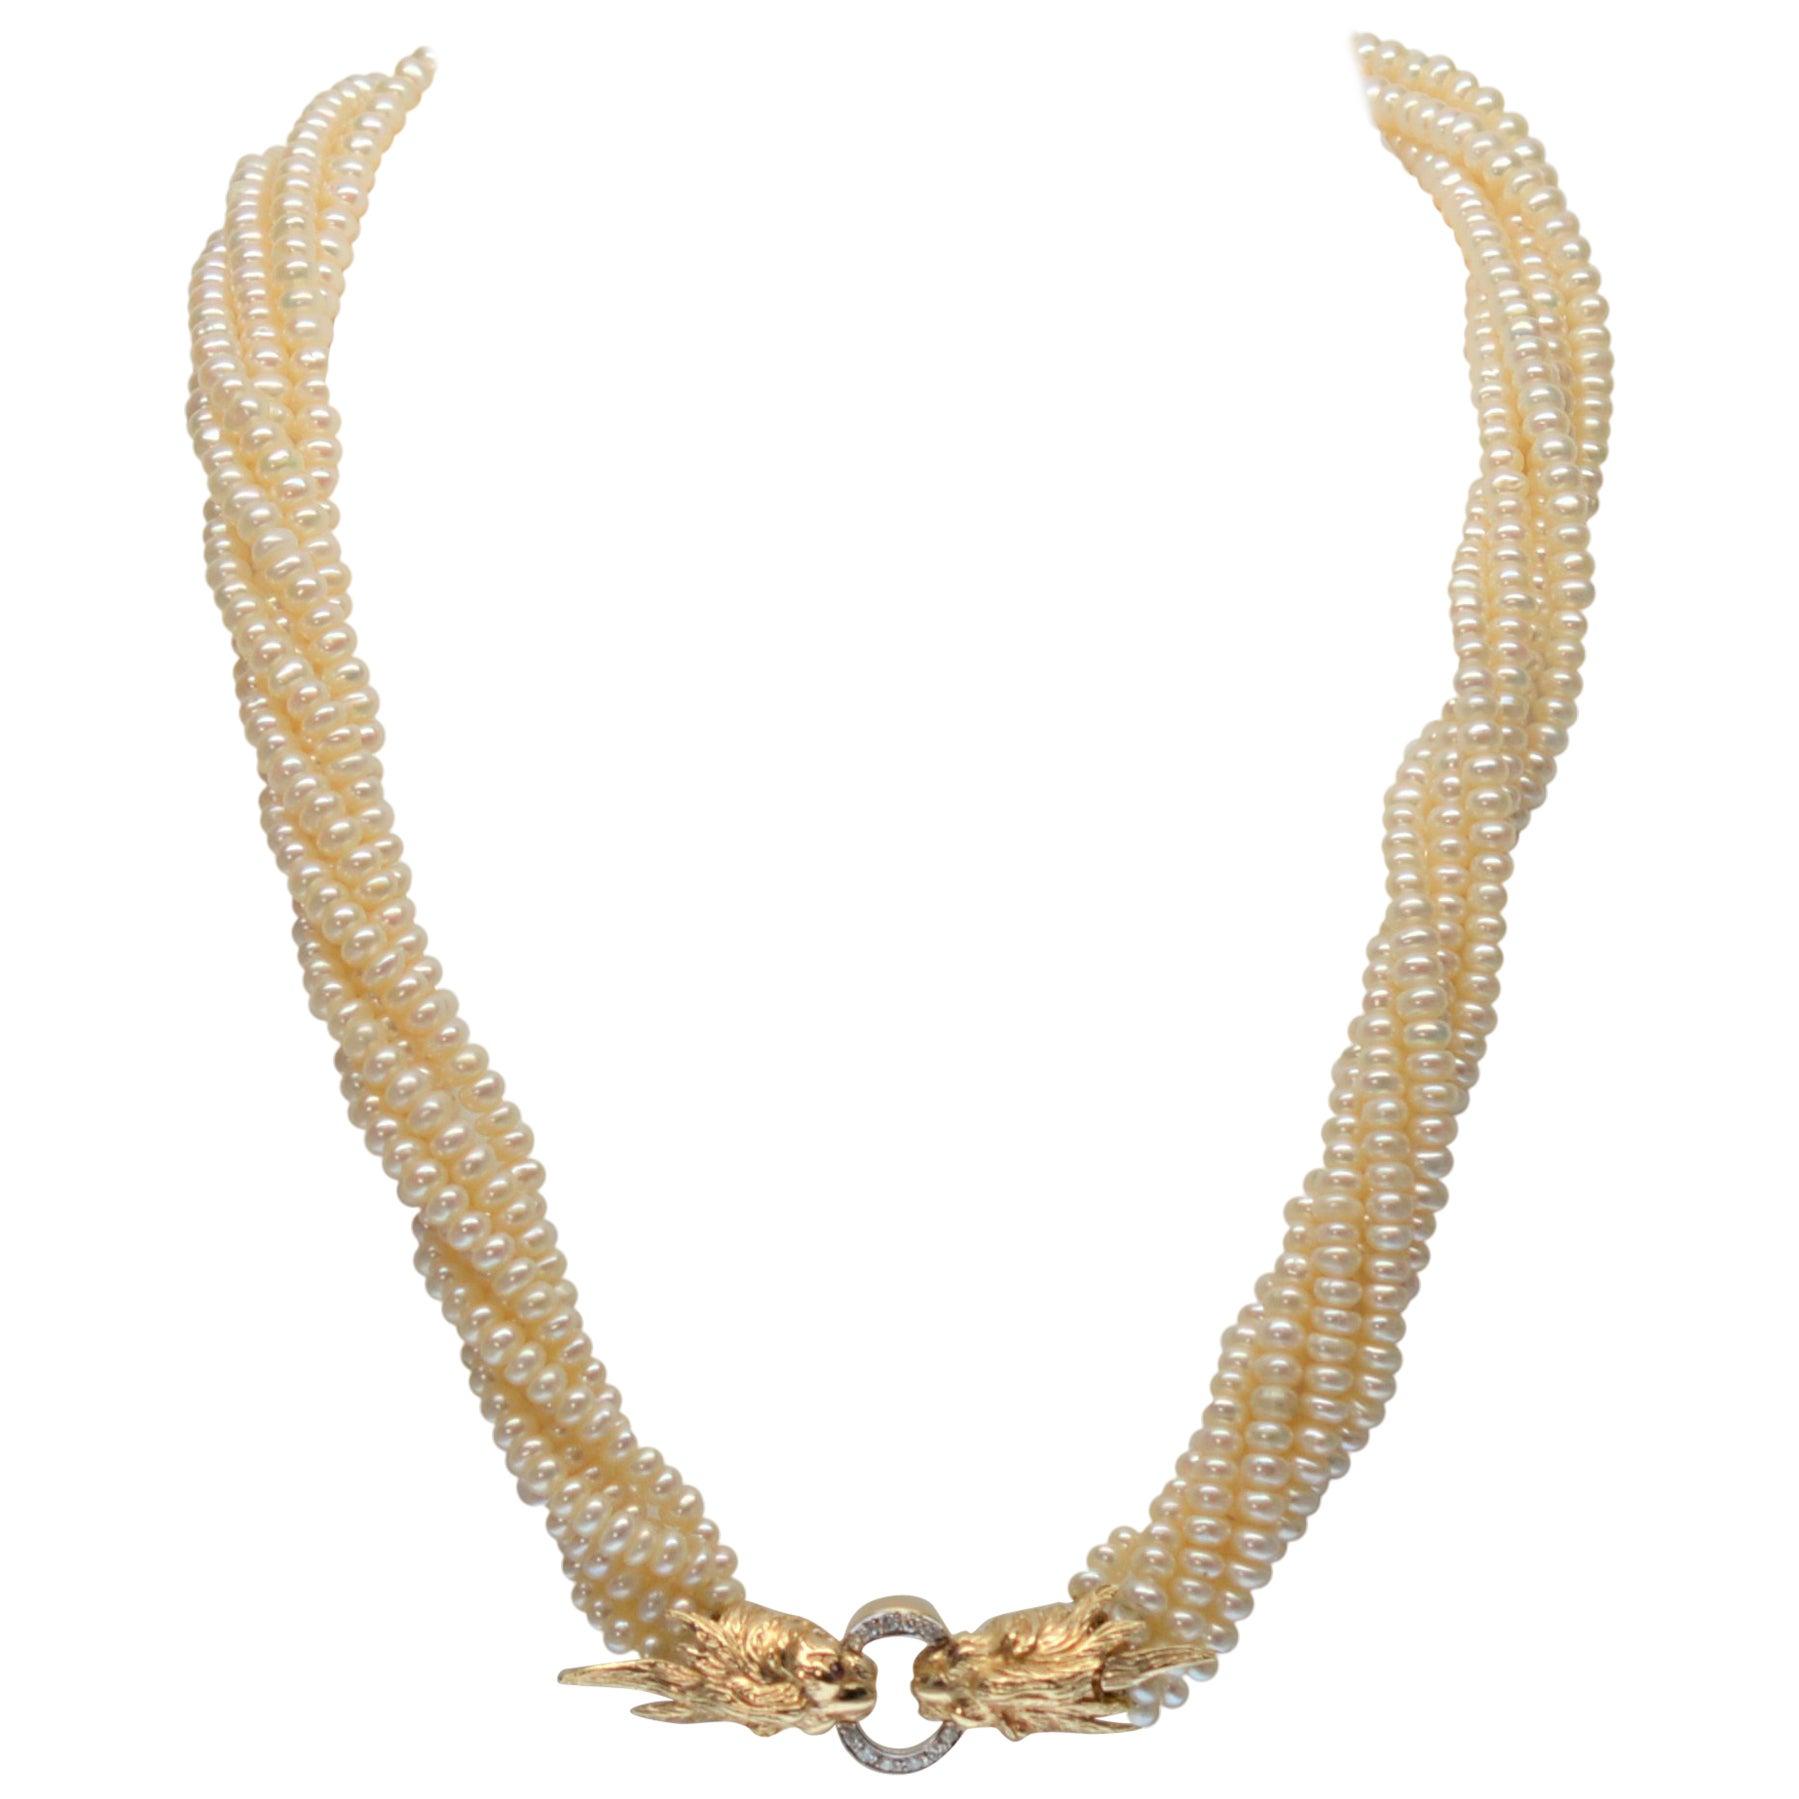 14 Karat Yellow Gold Twin Lion Head Multi-Strand Akoya Pearl Necklace